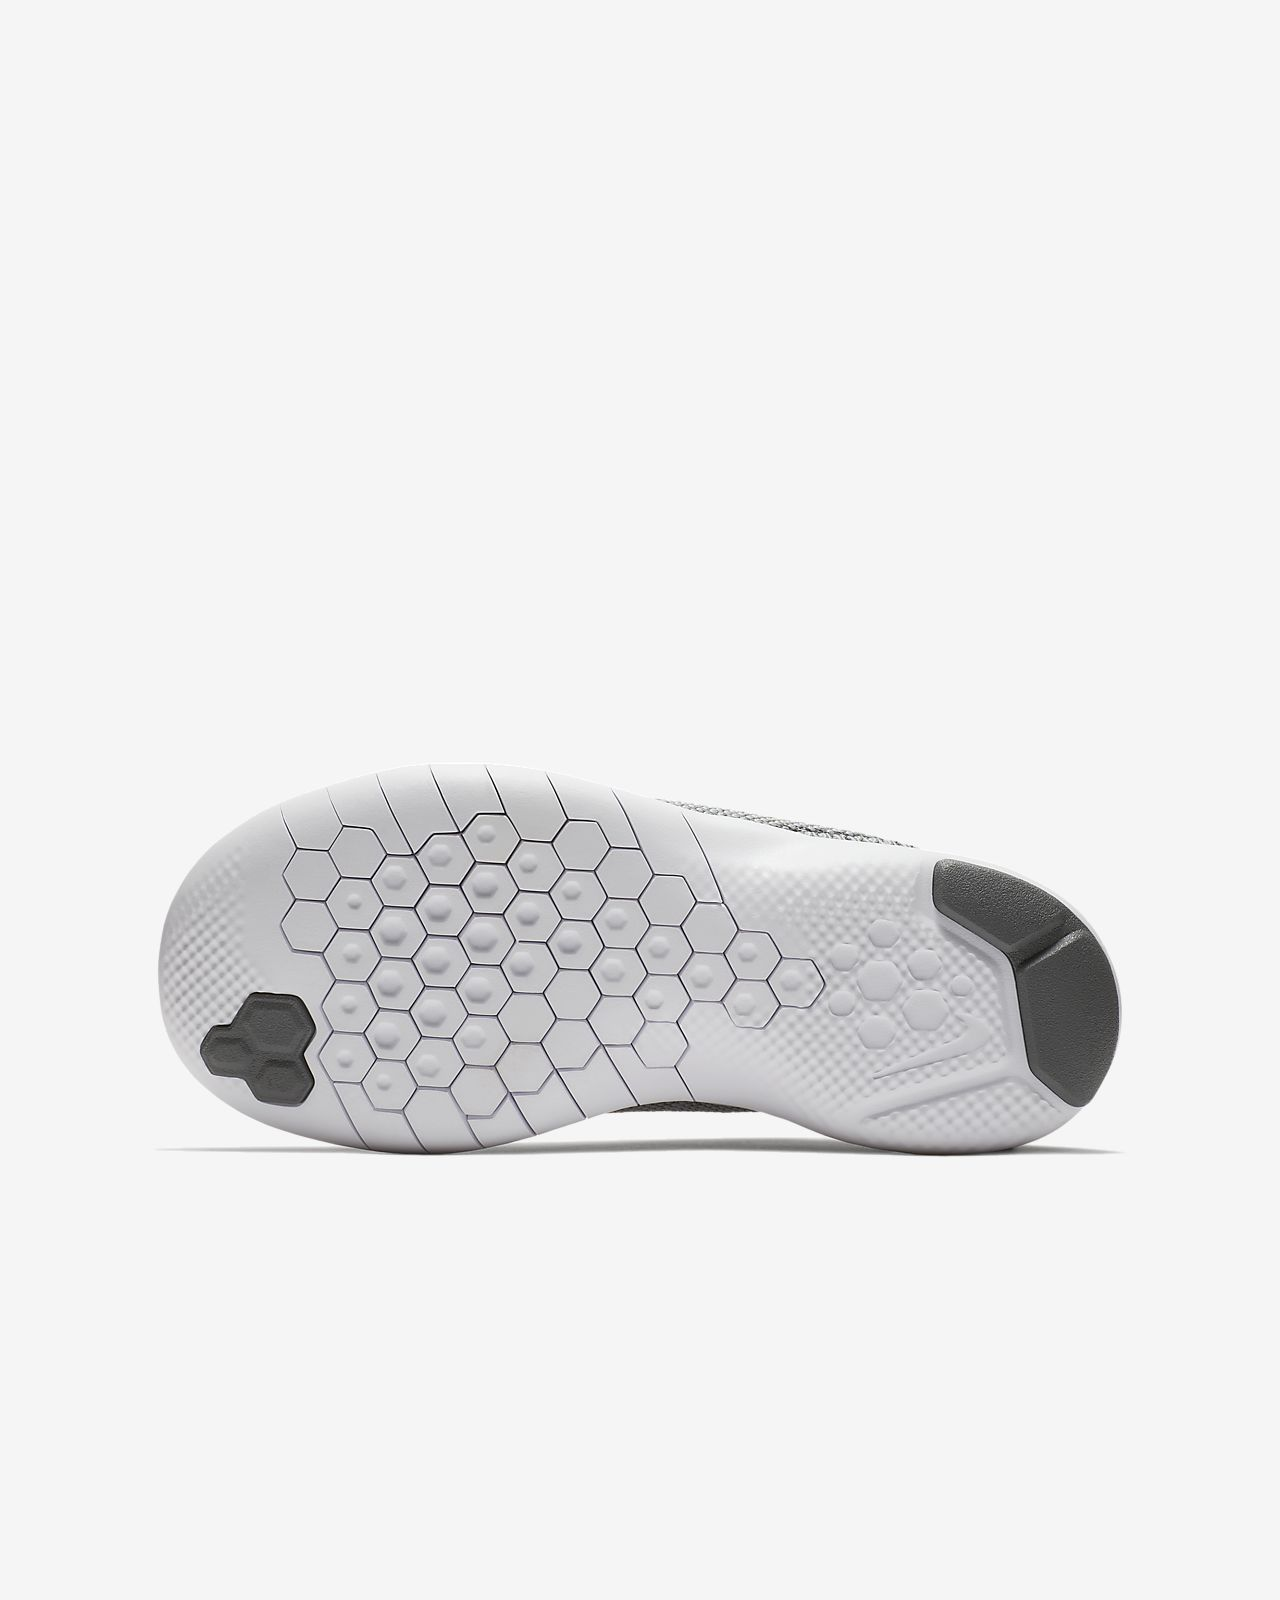 Nike Flex Experience Run 7 Zapatillas de running - Niño a. Nike.com ES 09c4652d9e61f